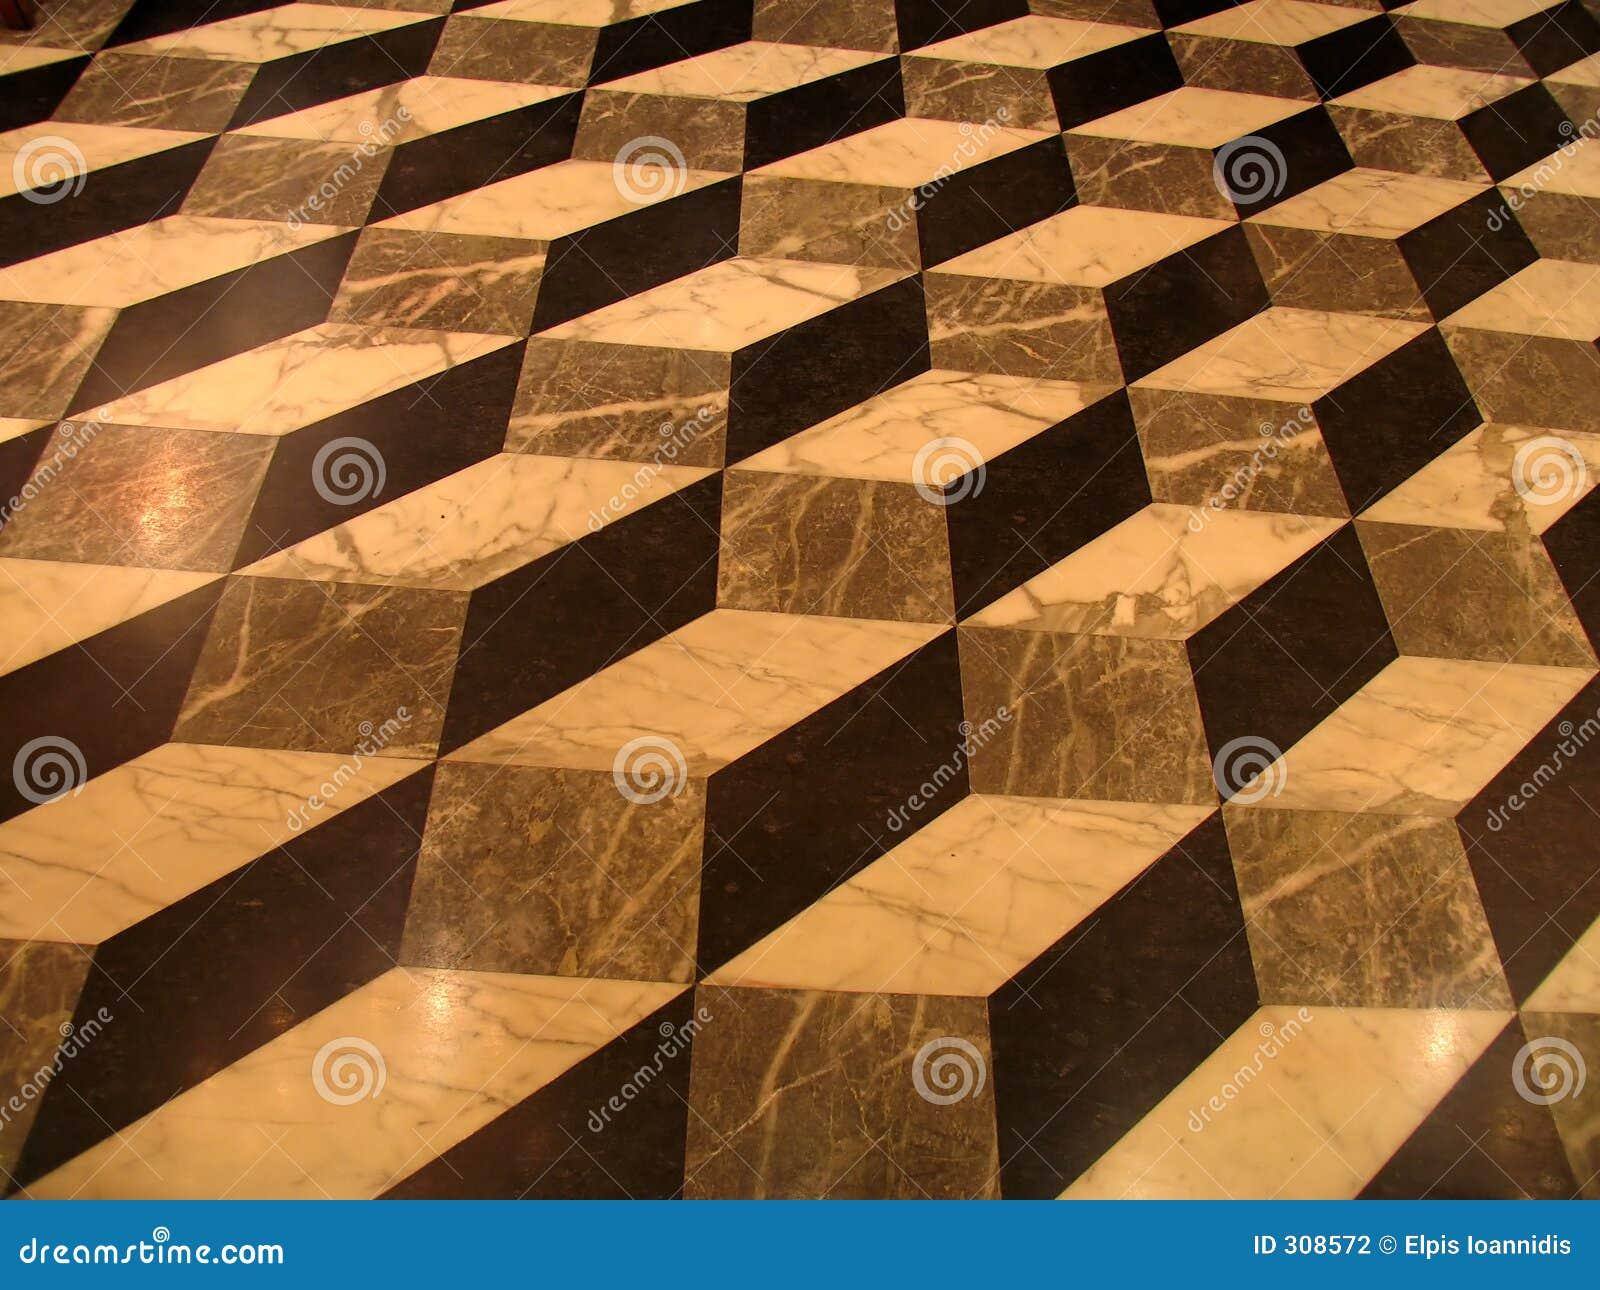 Geometric Tiles Stock Photography Image 308572